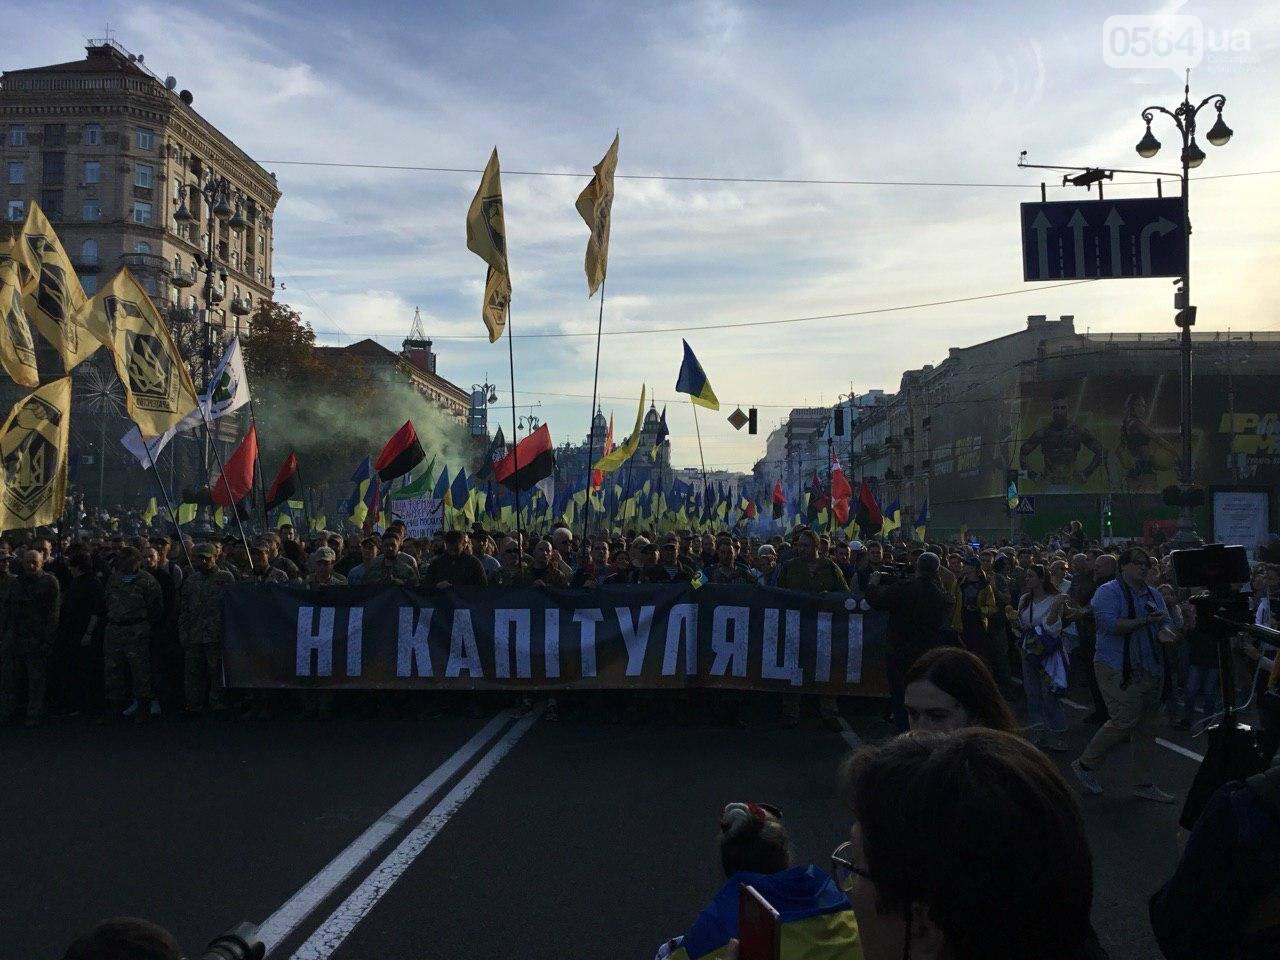 Криворожане поддержали Марш сопротивления капитуляции в Киеве, - ФОТО, ВИДЕО, ОБНОВЛЕНО, фото-8